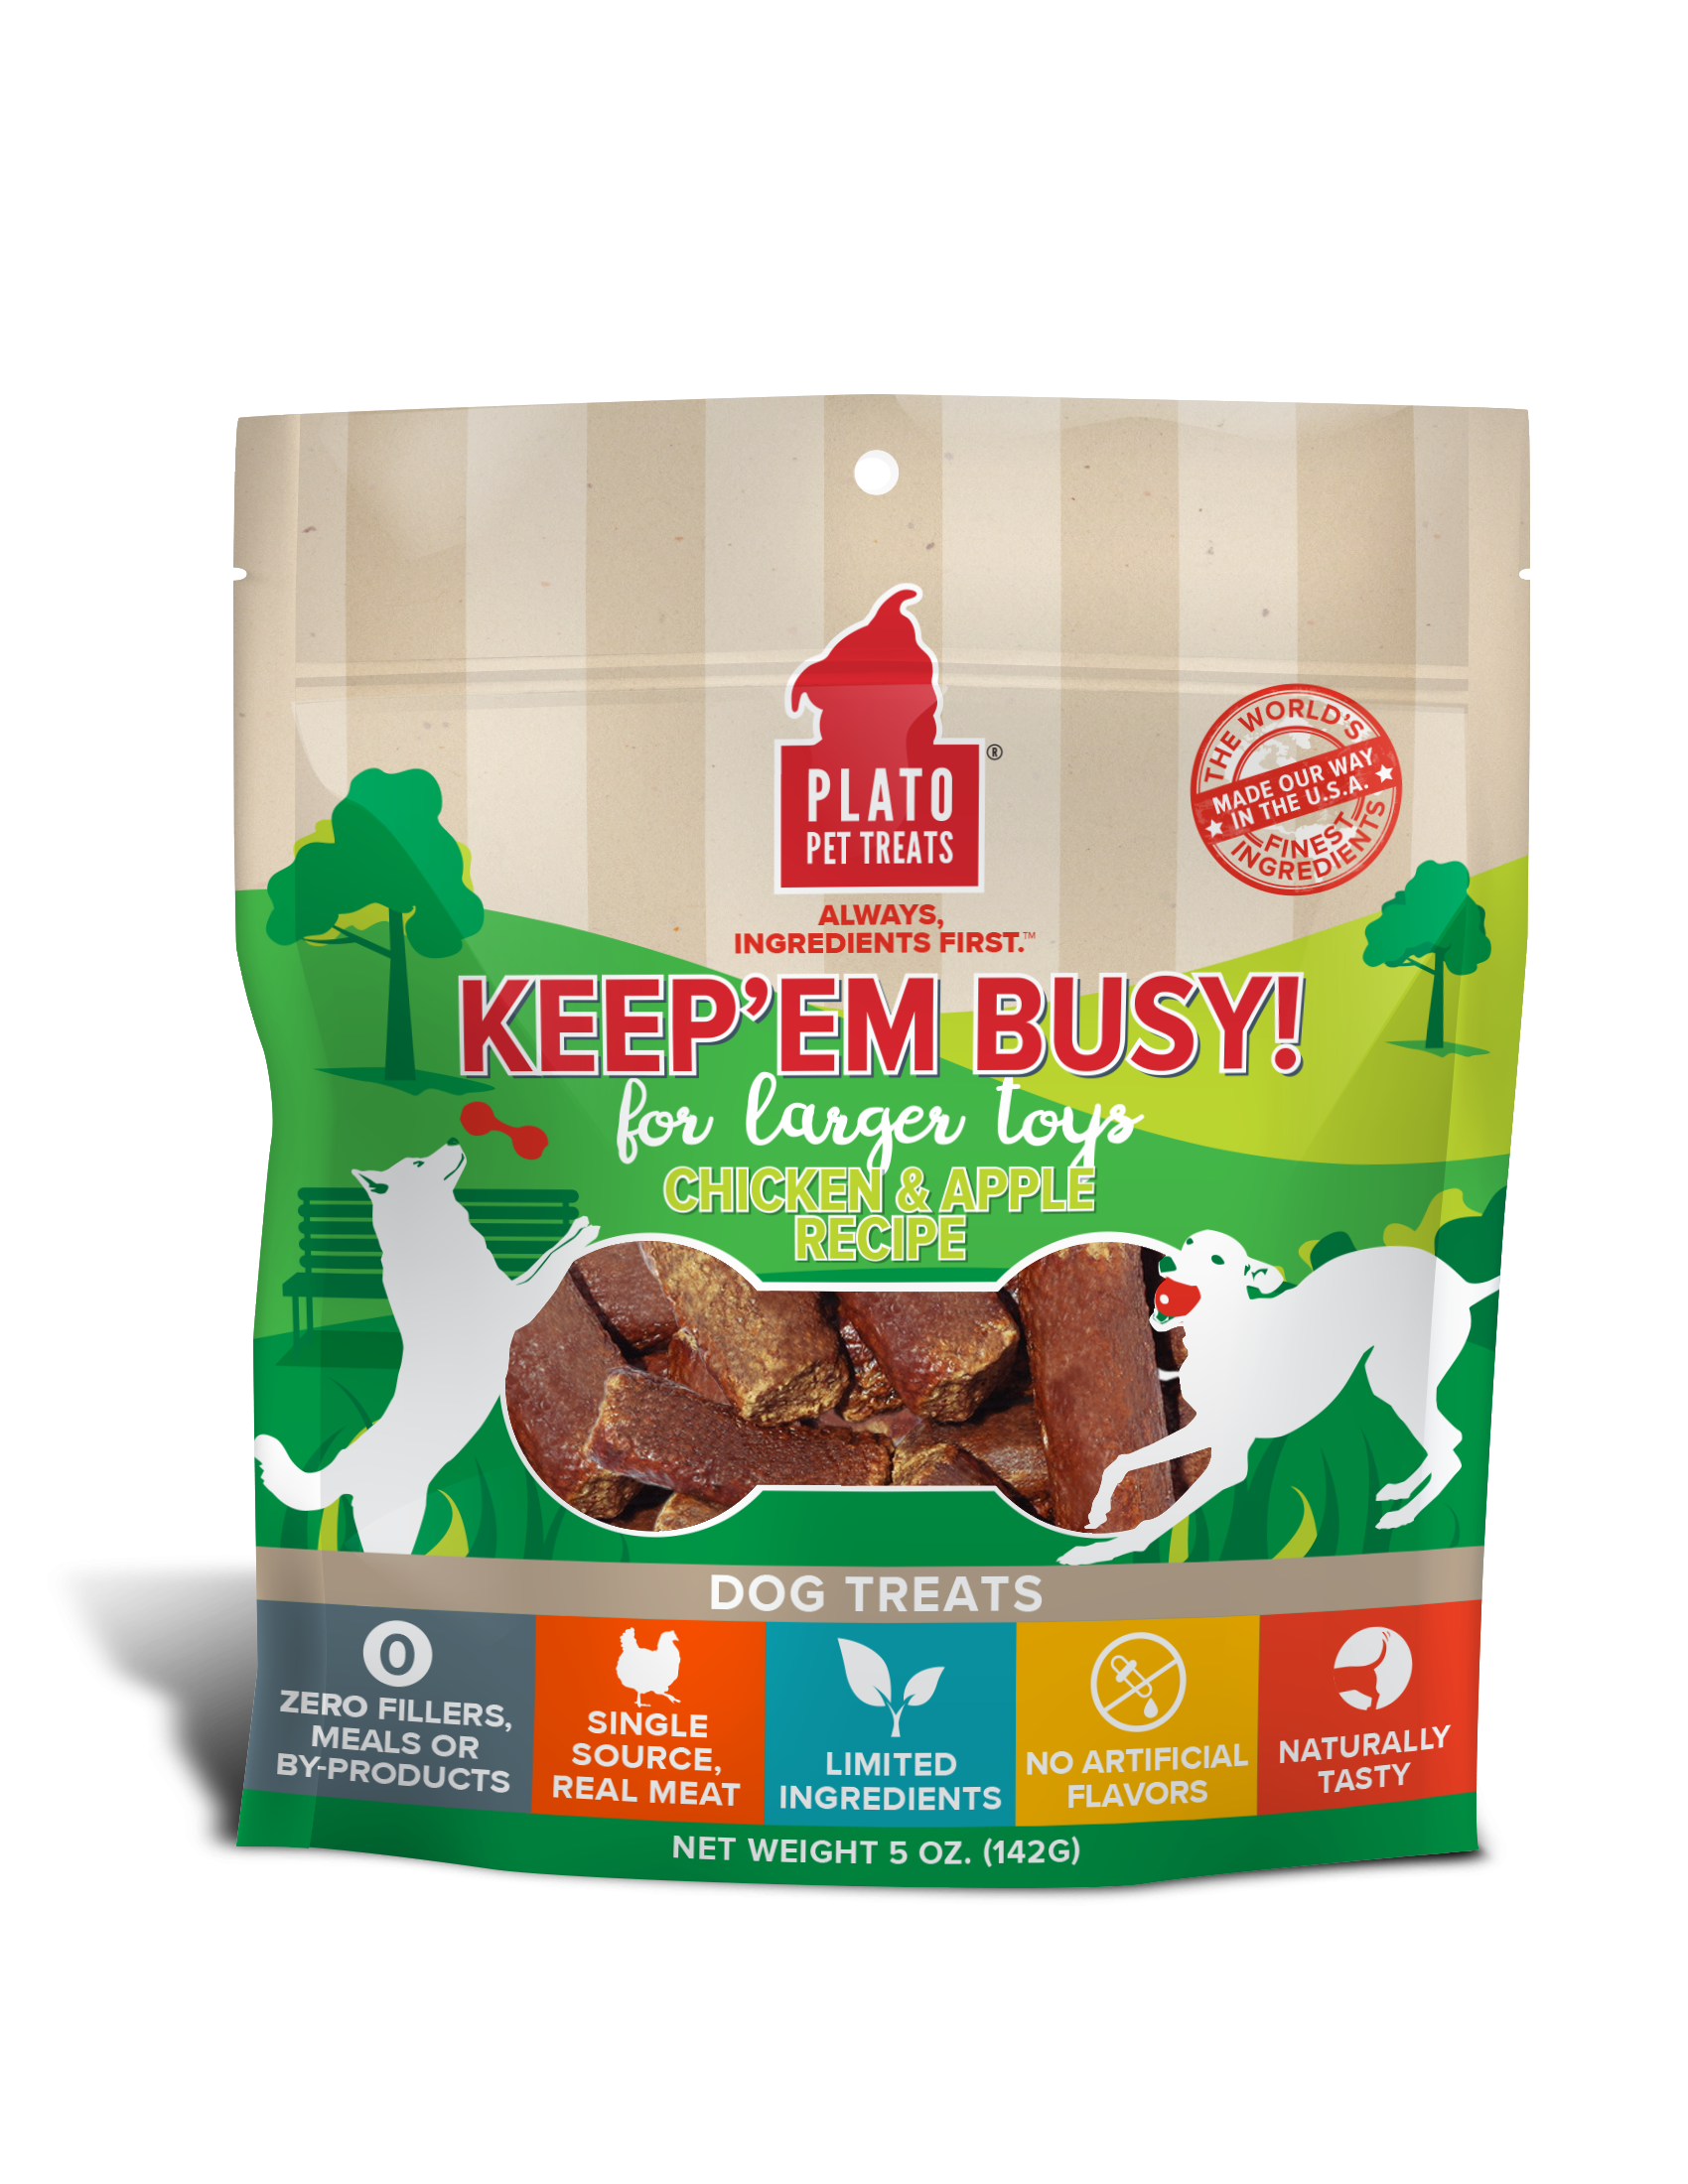 Plato Pet Treats Keep Em' Busy! Chicken & Apple Recipe Large Toy Stuffer Dog Treats, 5-oz (Size: 5-oz) Image